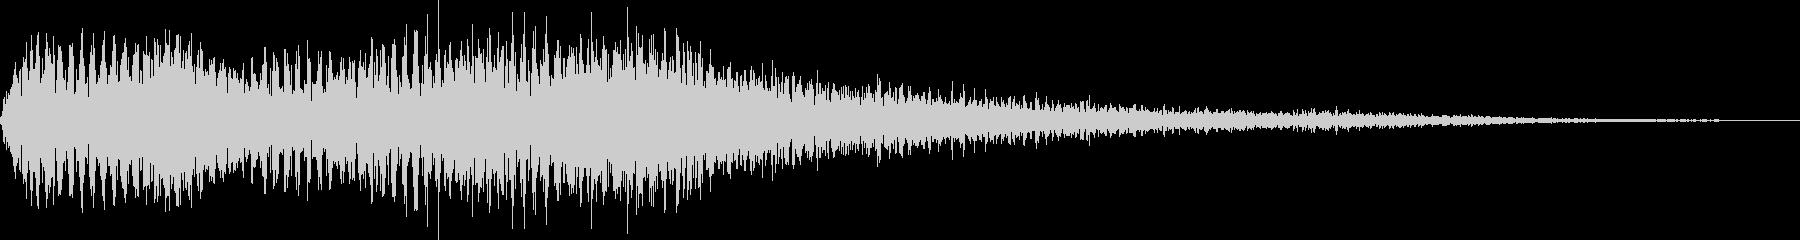 Sound logo: A beautiful low alto chorus's unreproduced waveform